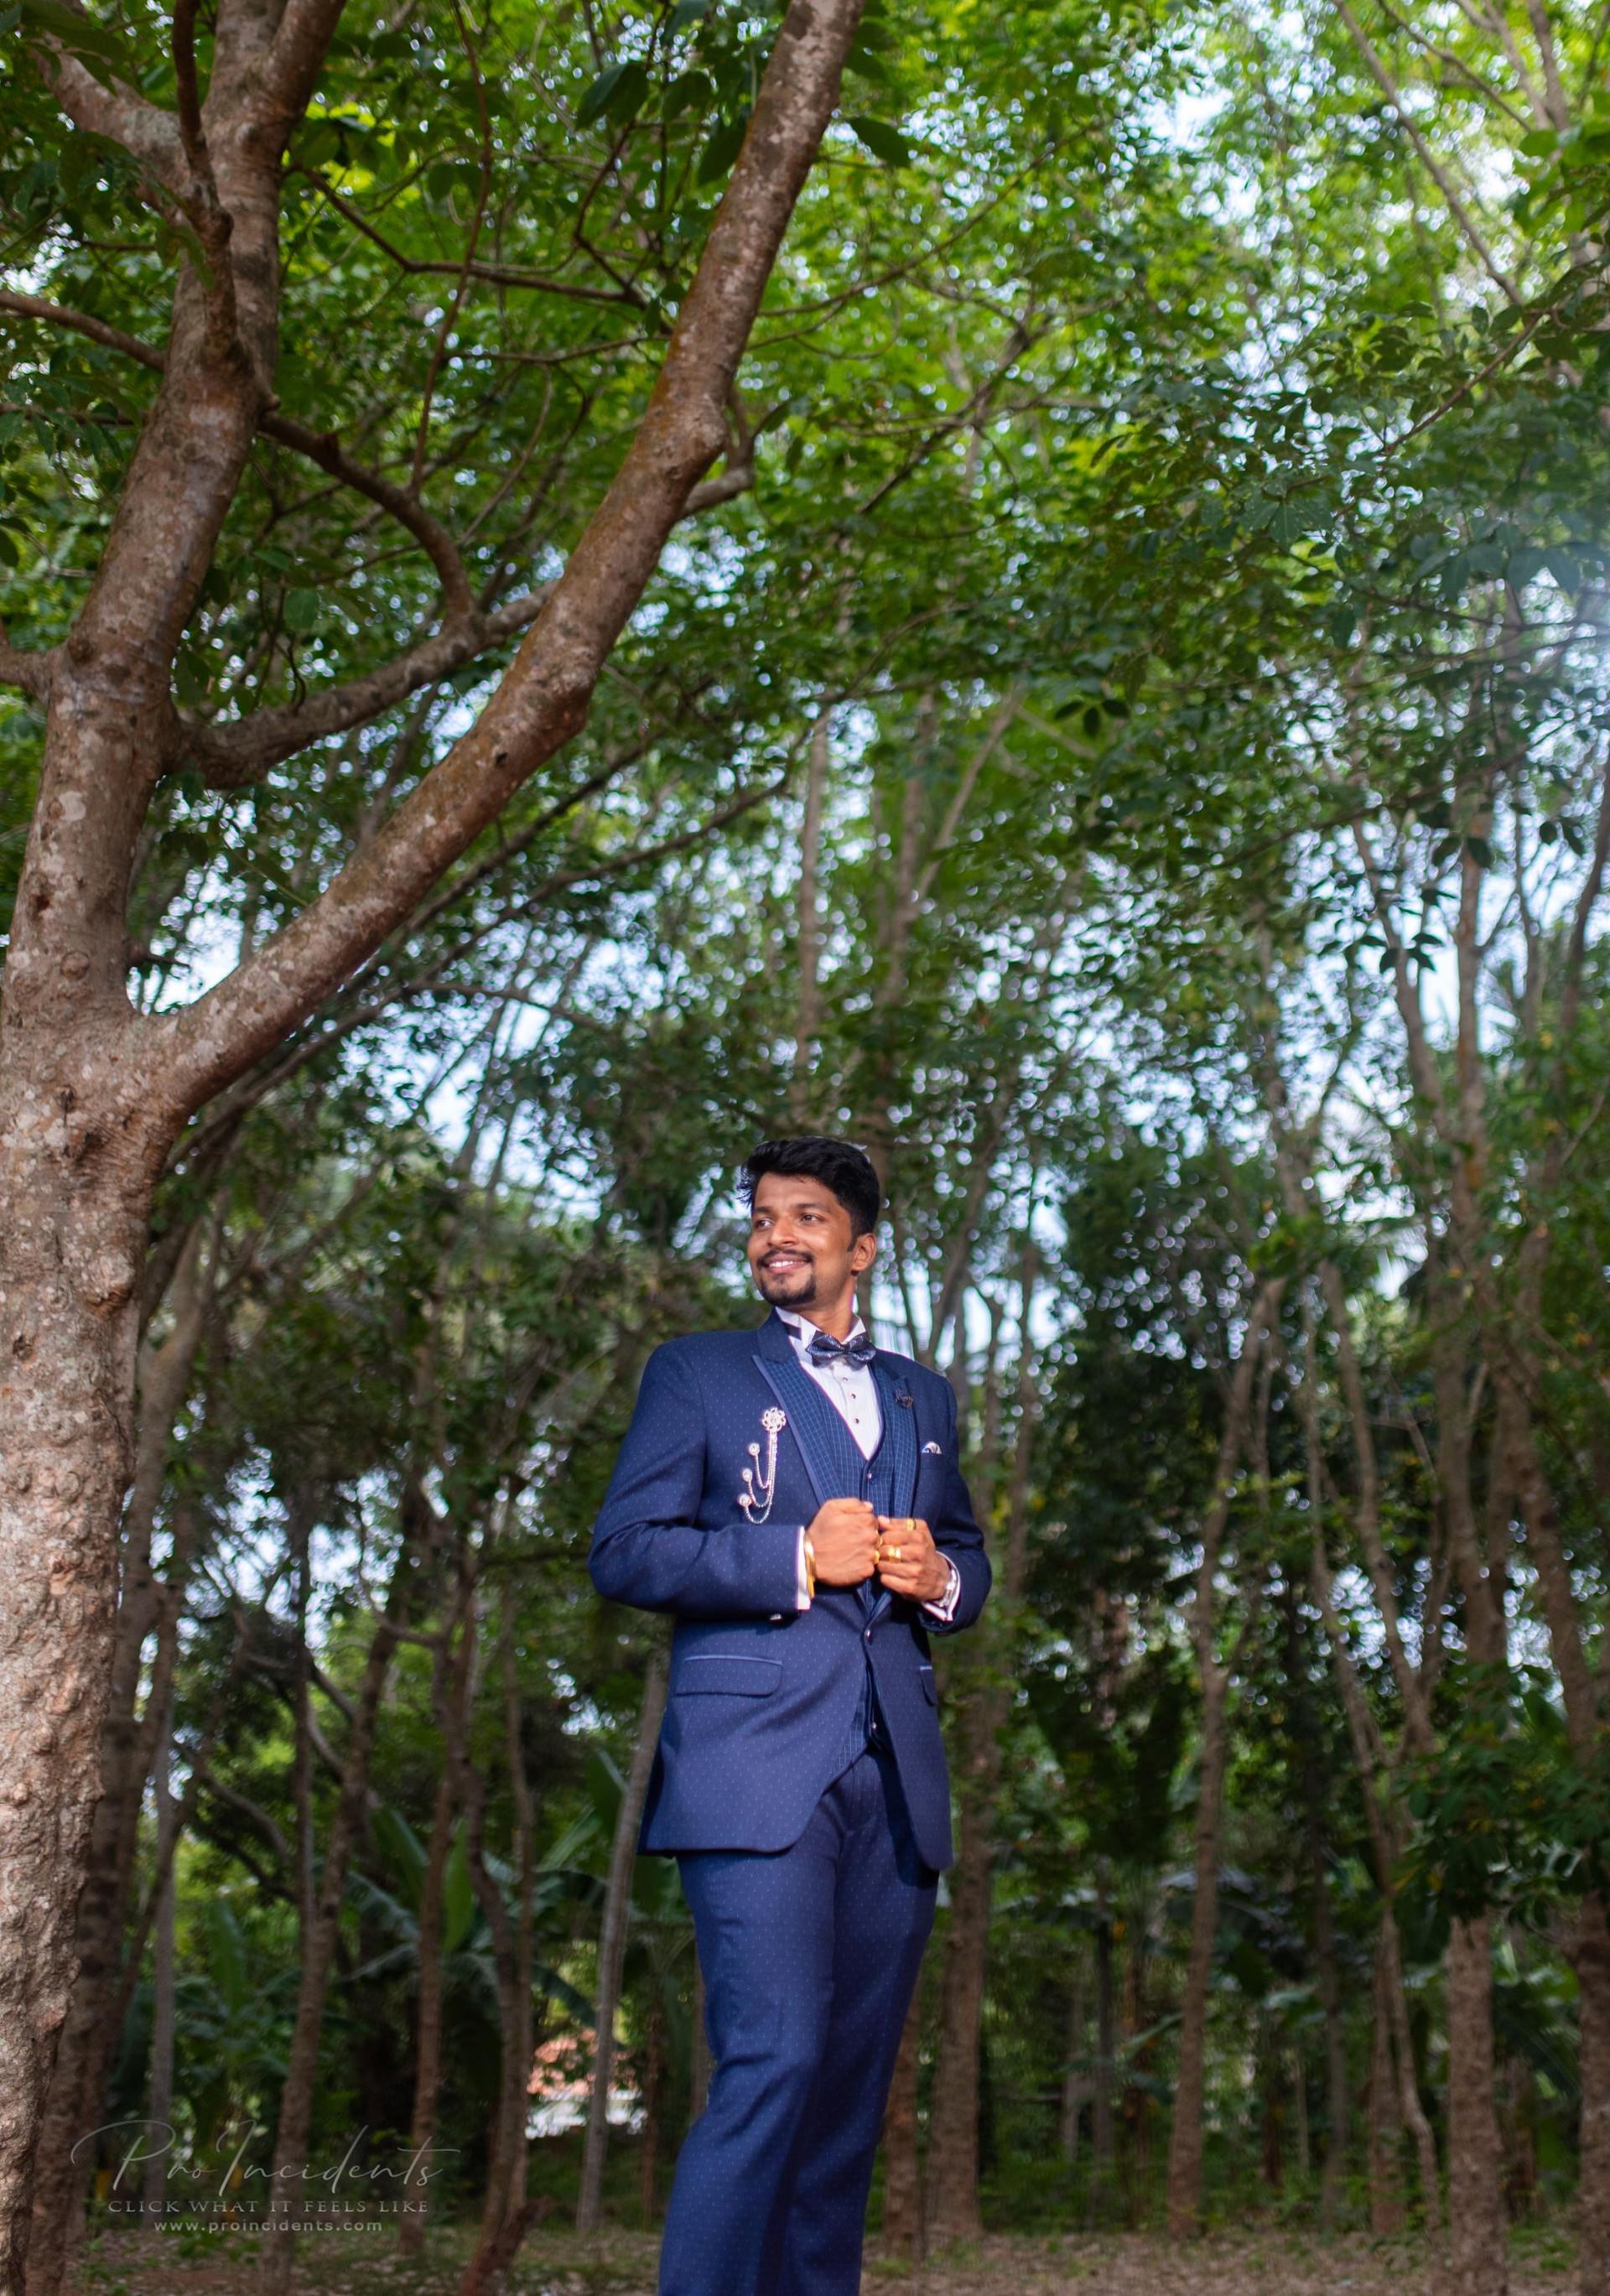 CSI Candid wedding outdoor Photographer marthandam